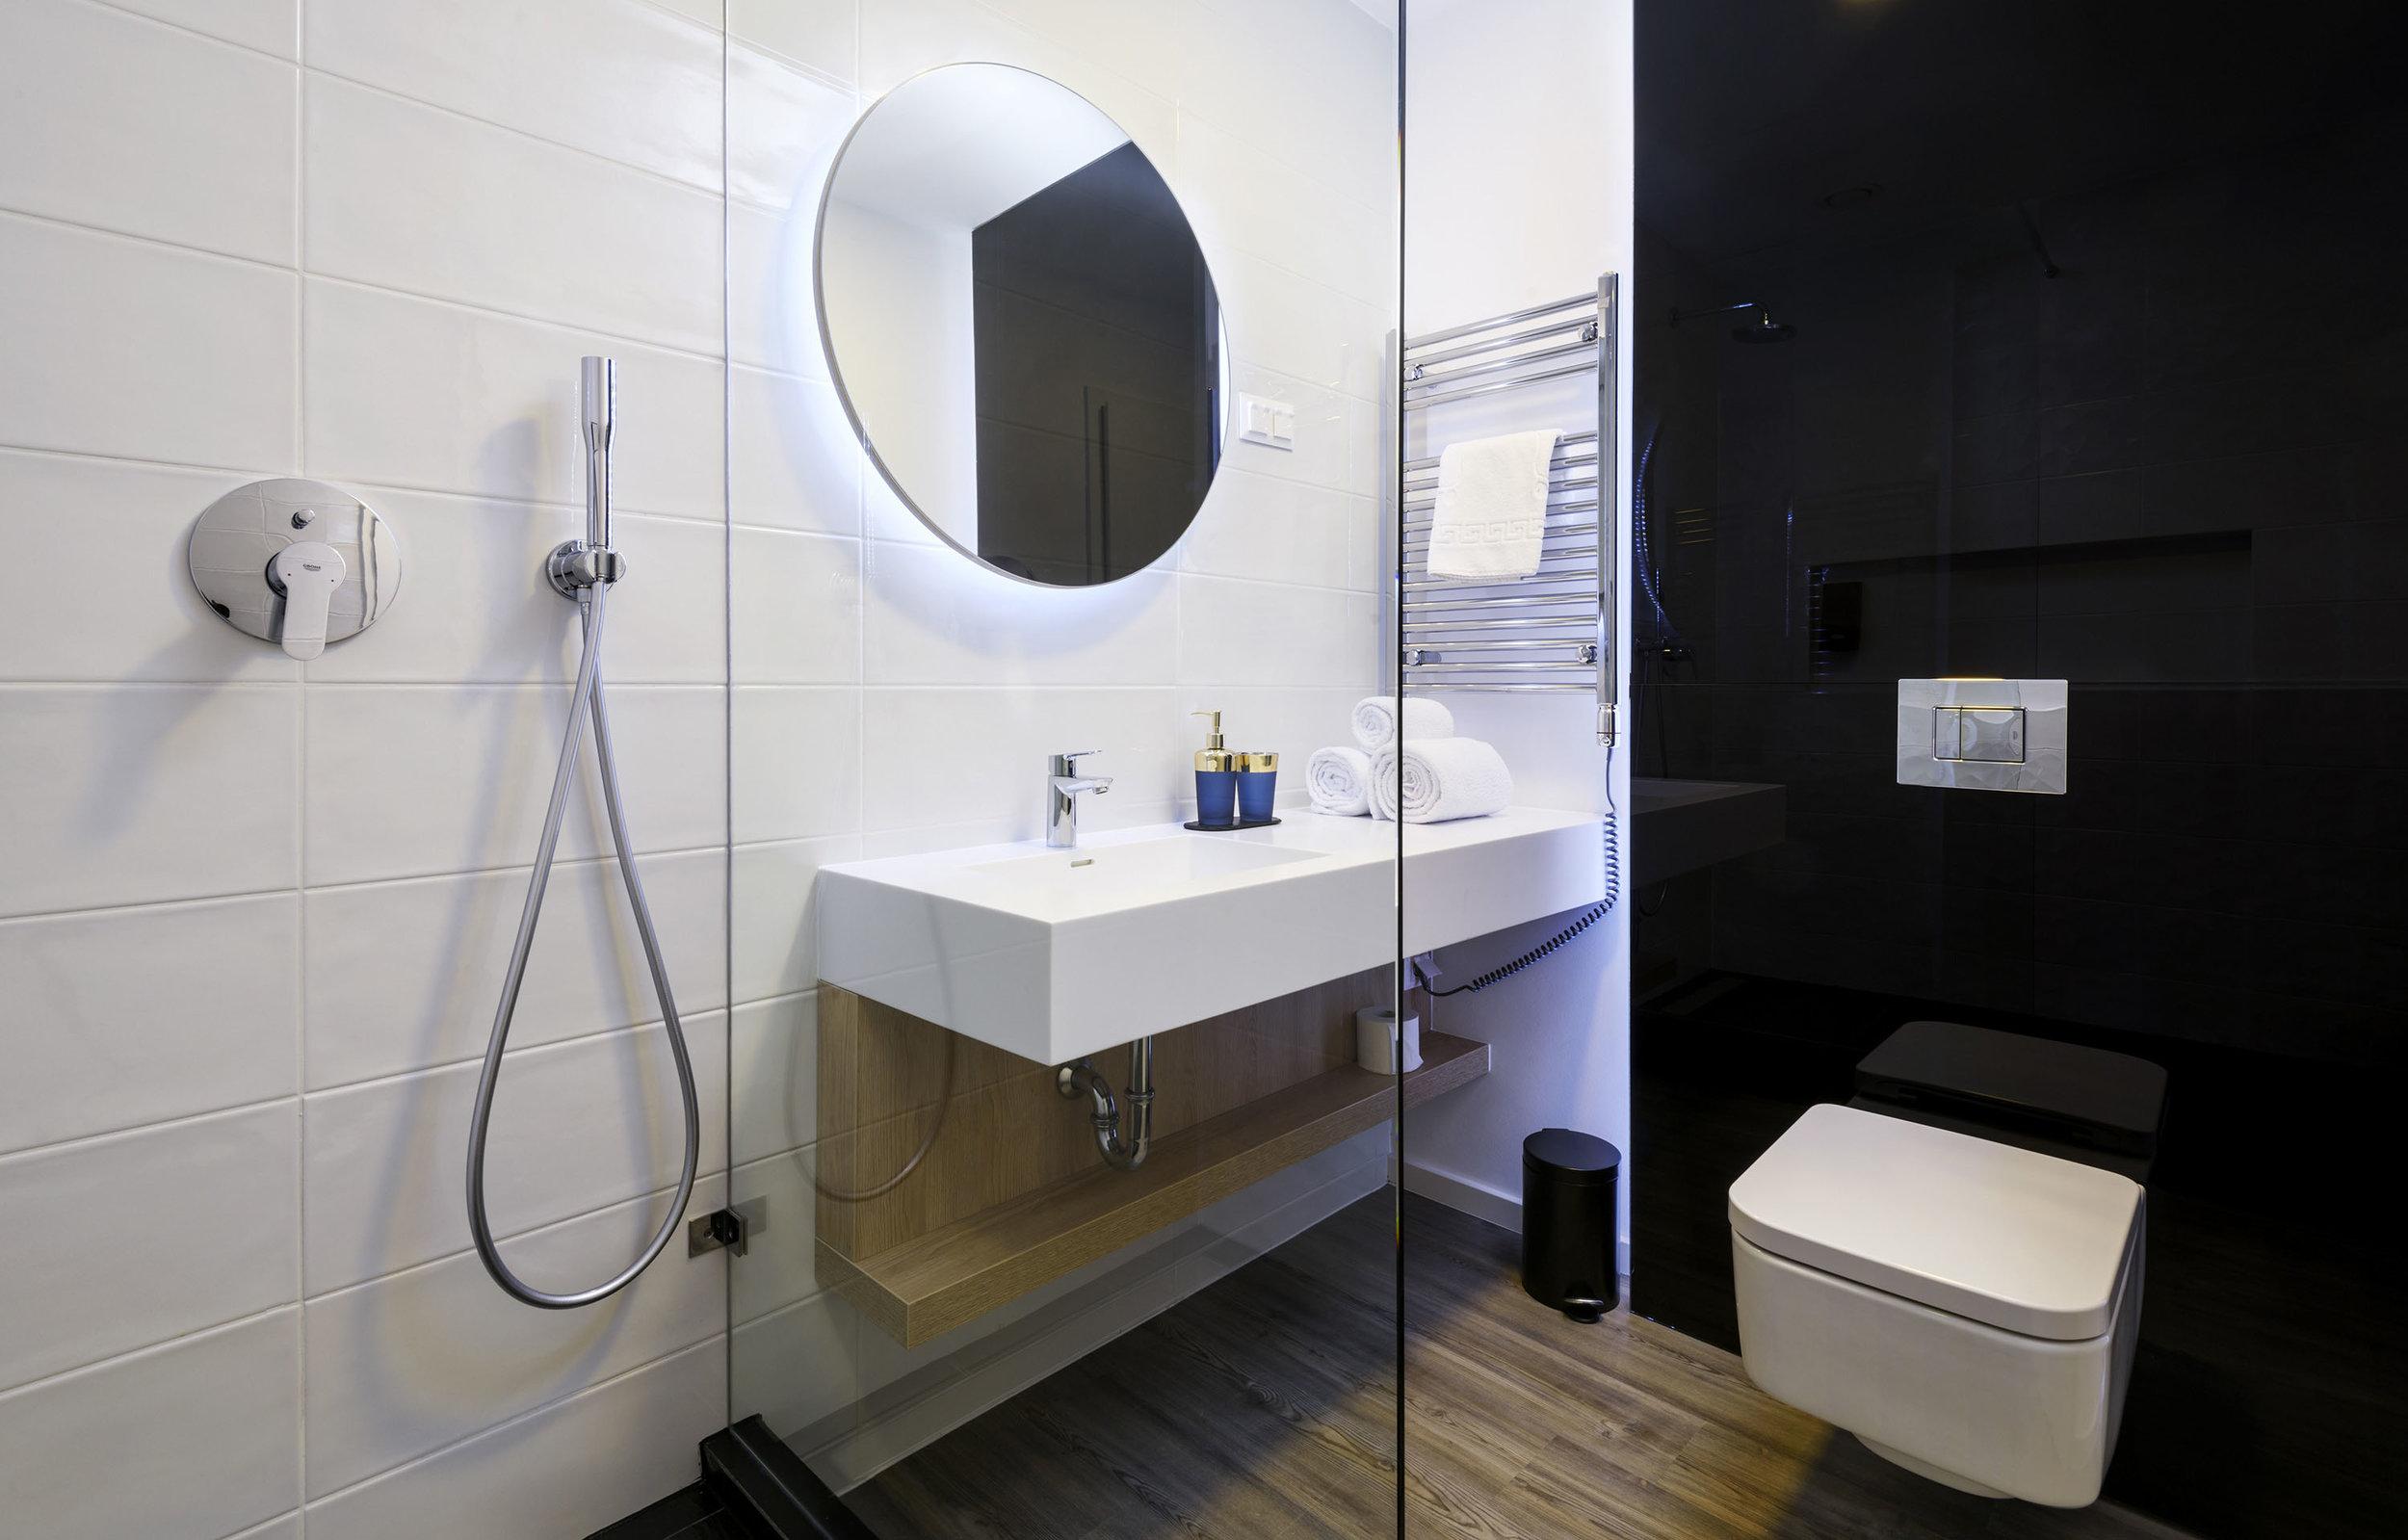 KVI_Hotel_305_04_mod.jpg